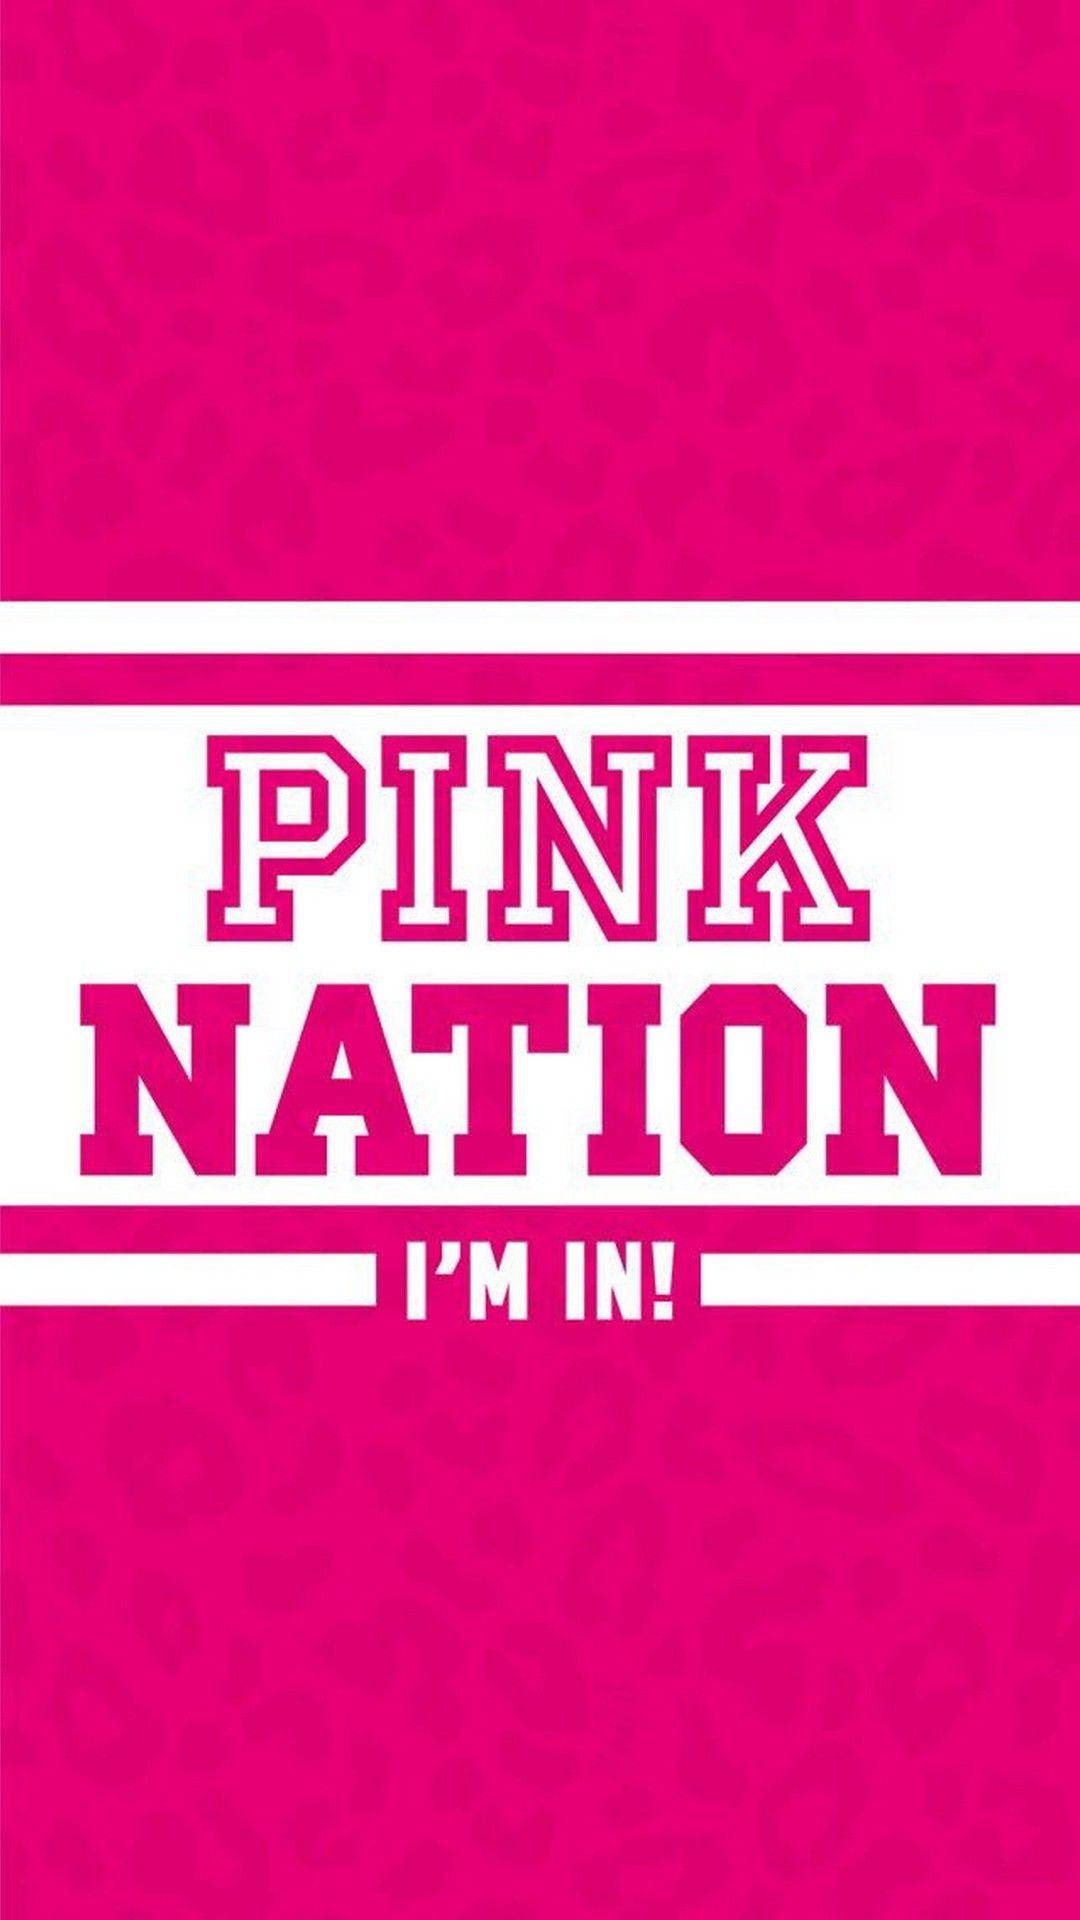 Pink Nation Wallpaper For Mobile